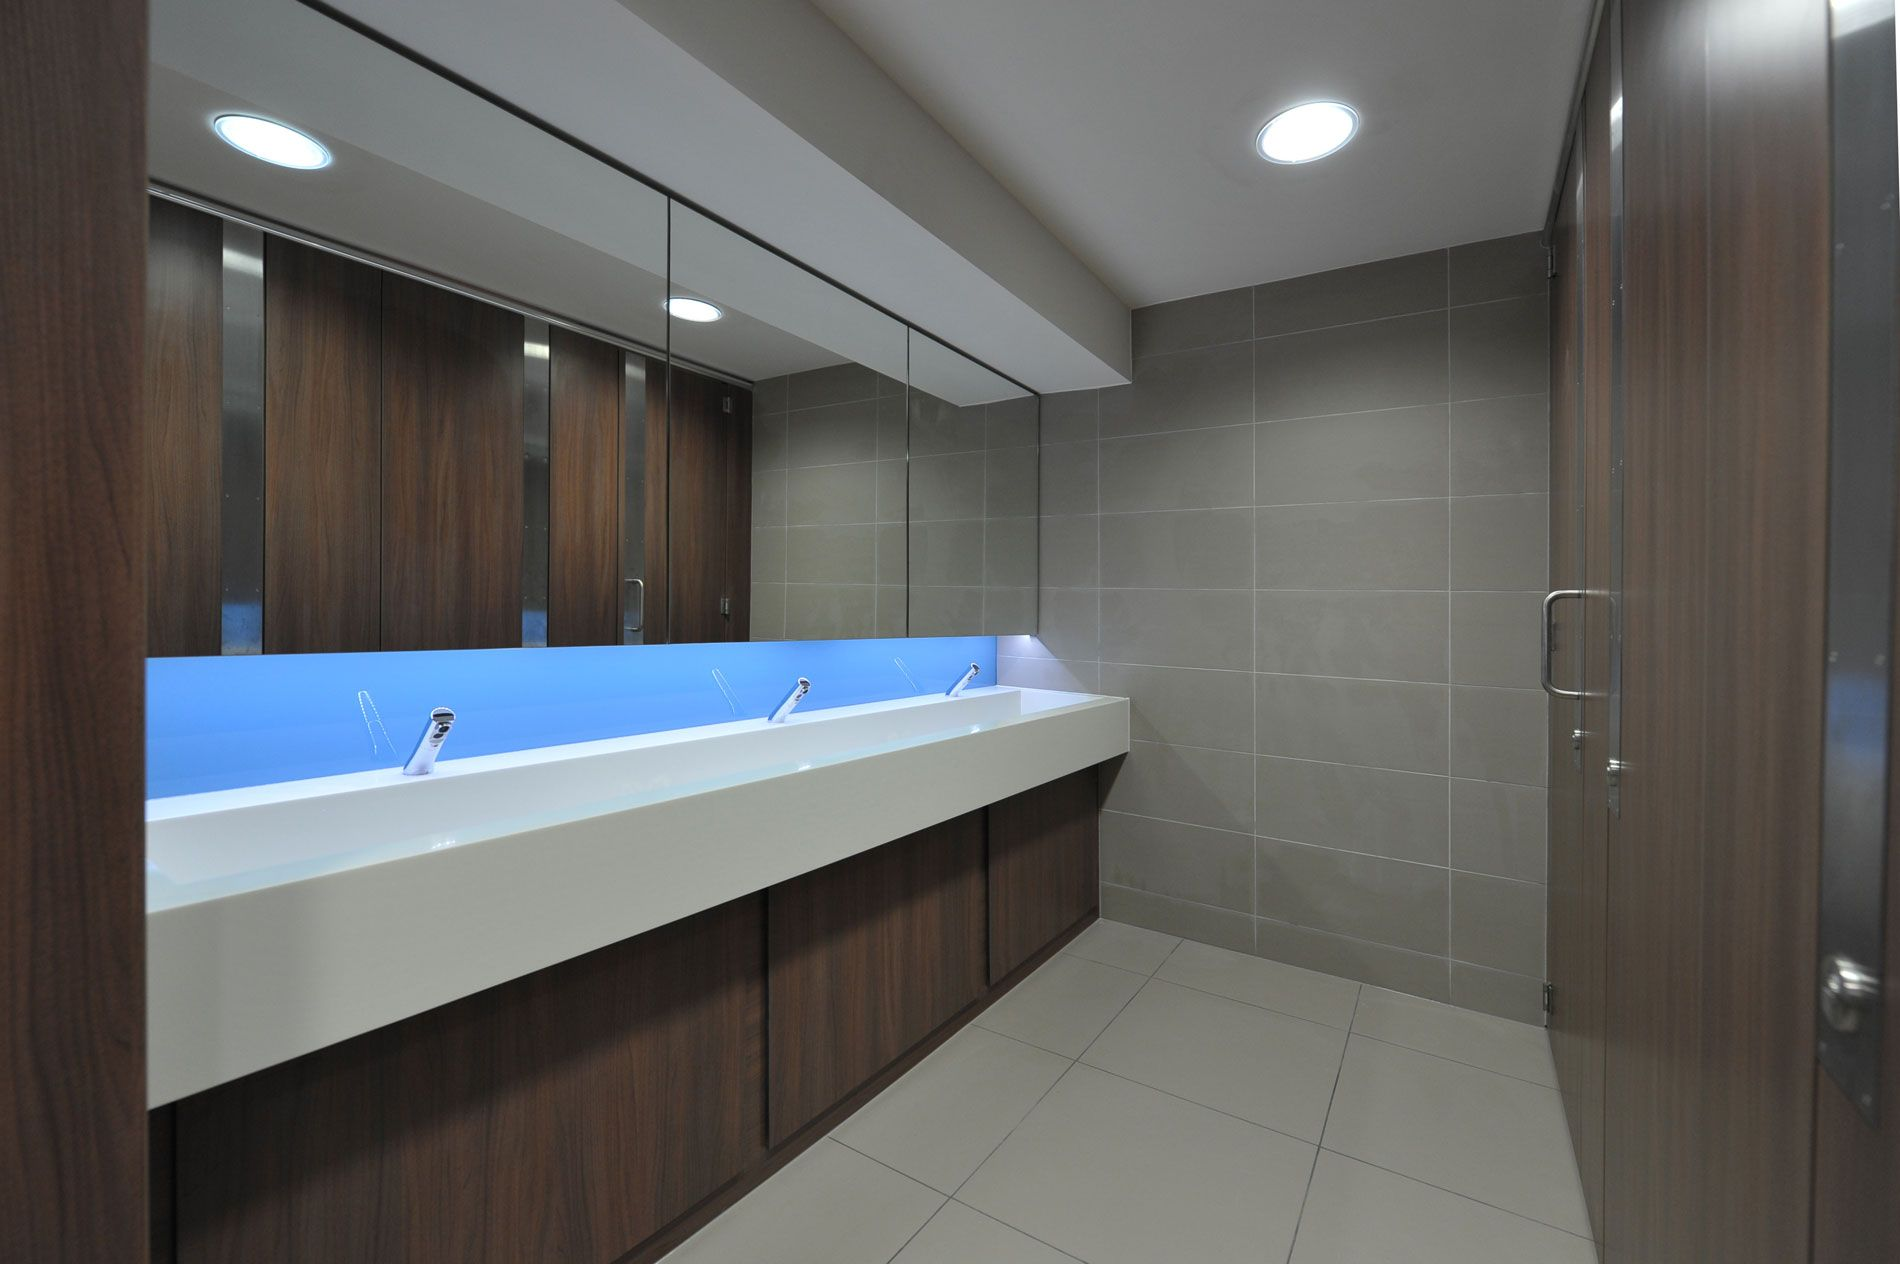 office bathrooms. About Us | Maxwood Washrooms · Office BathroomWashroomRestroom Bathrooms C